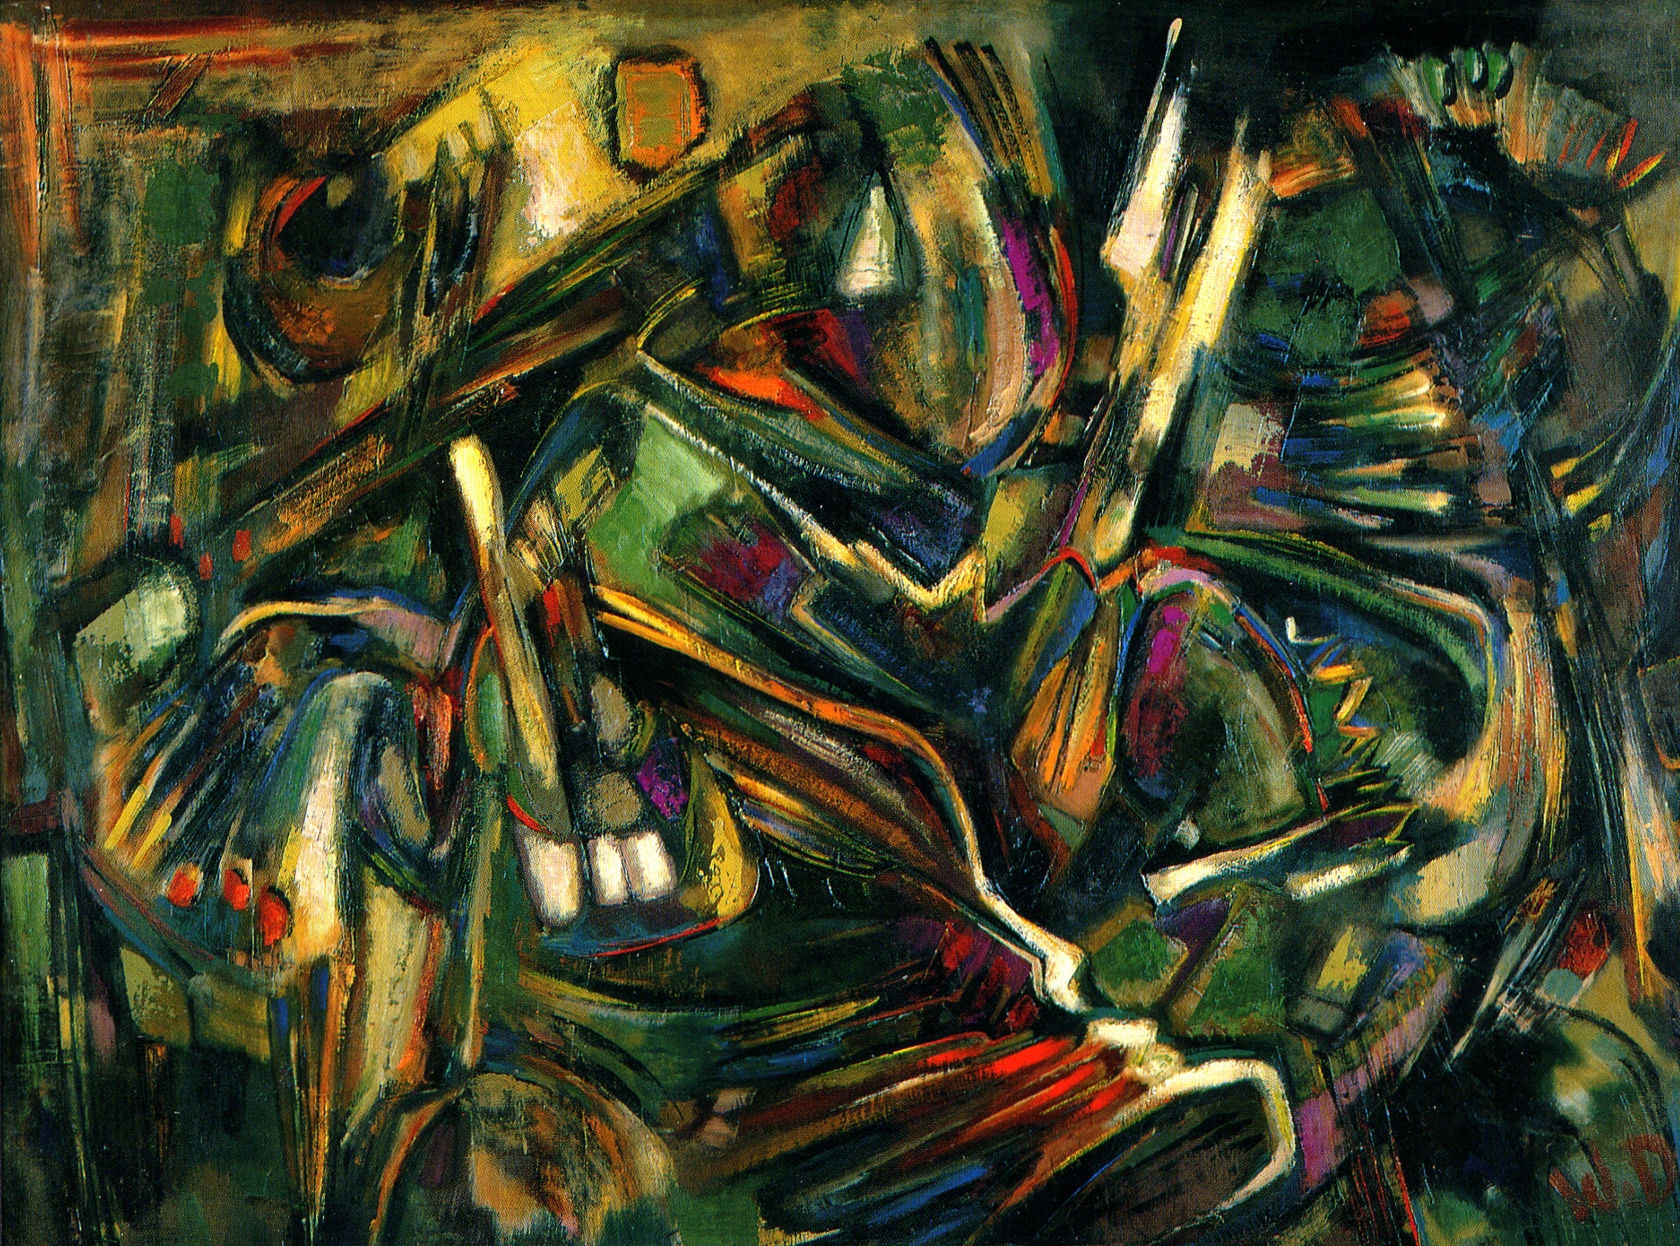 Wladyslaw Dutkiewicz,  Vibrato , 1962, oil on board